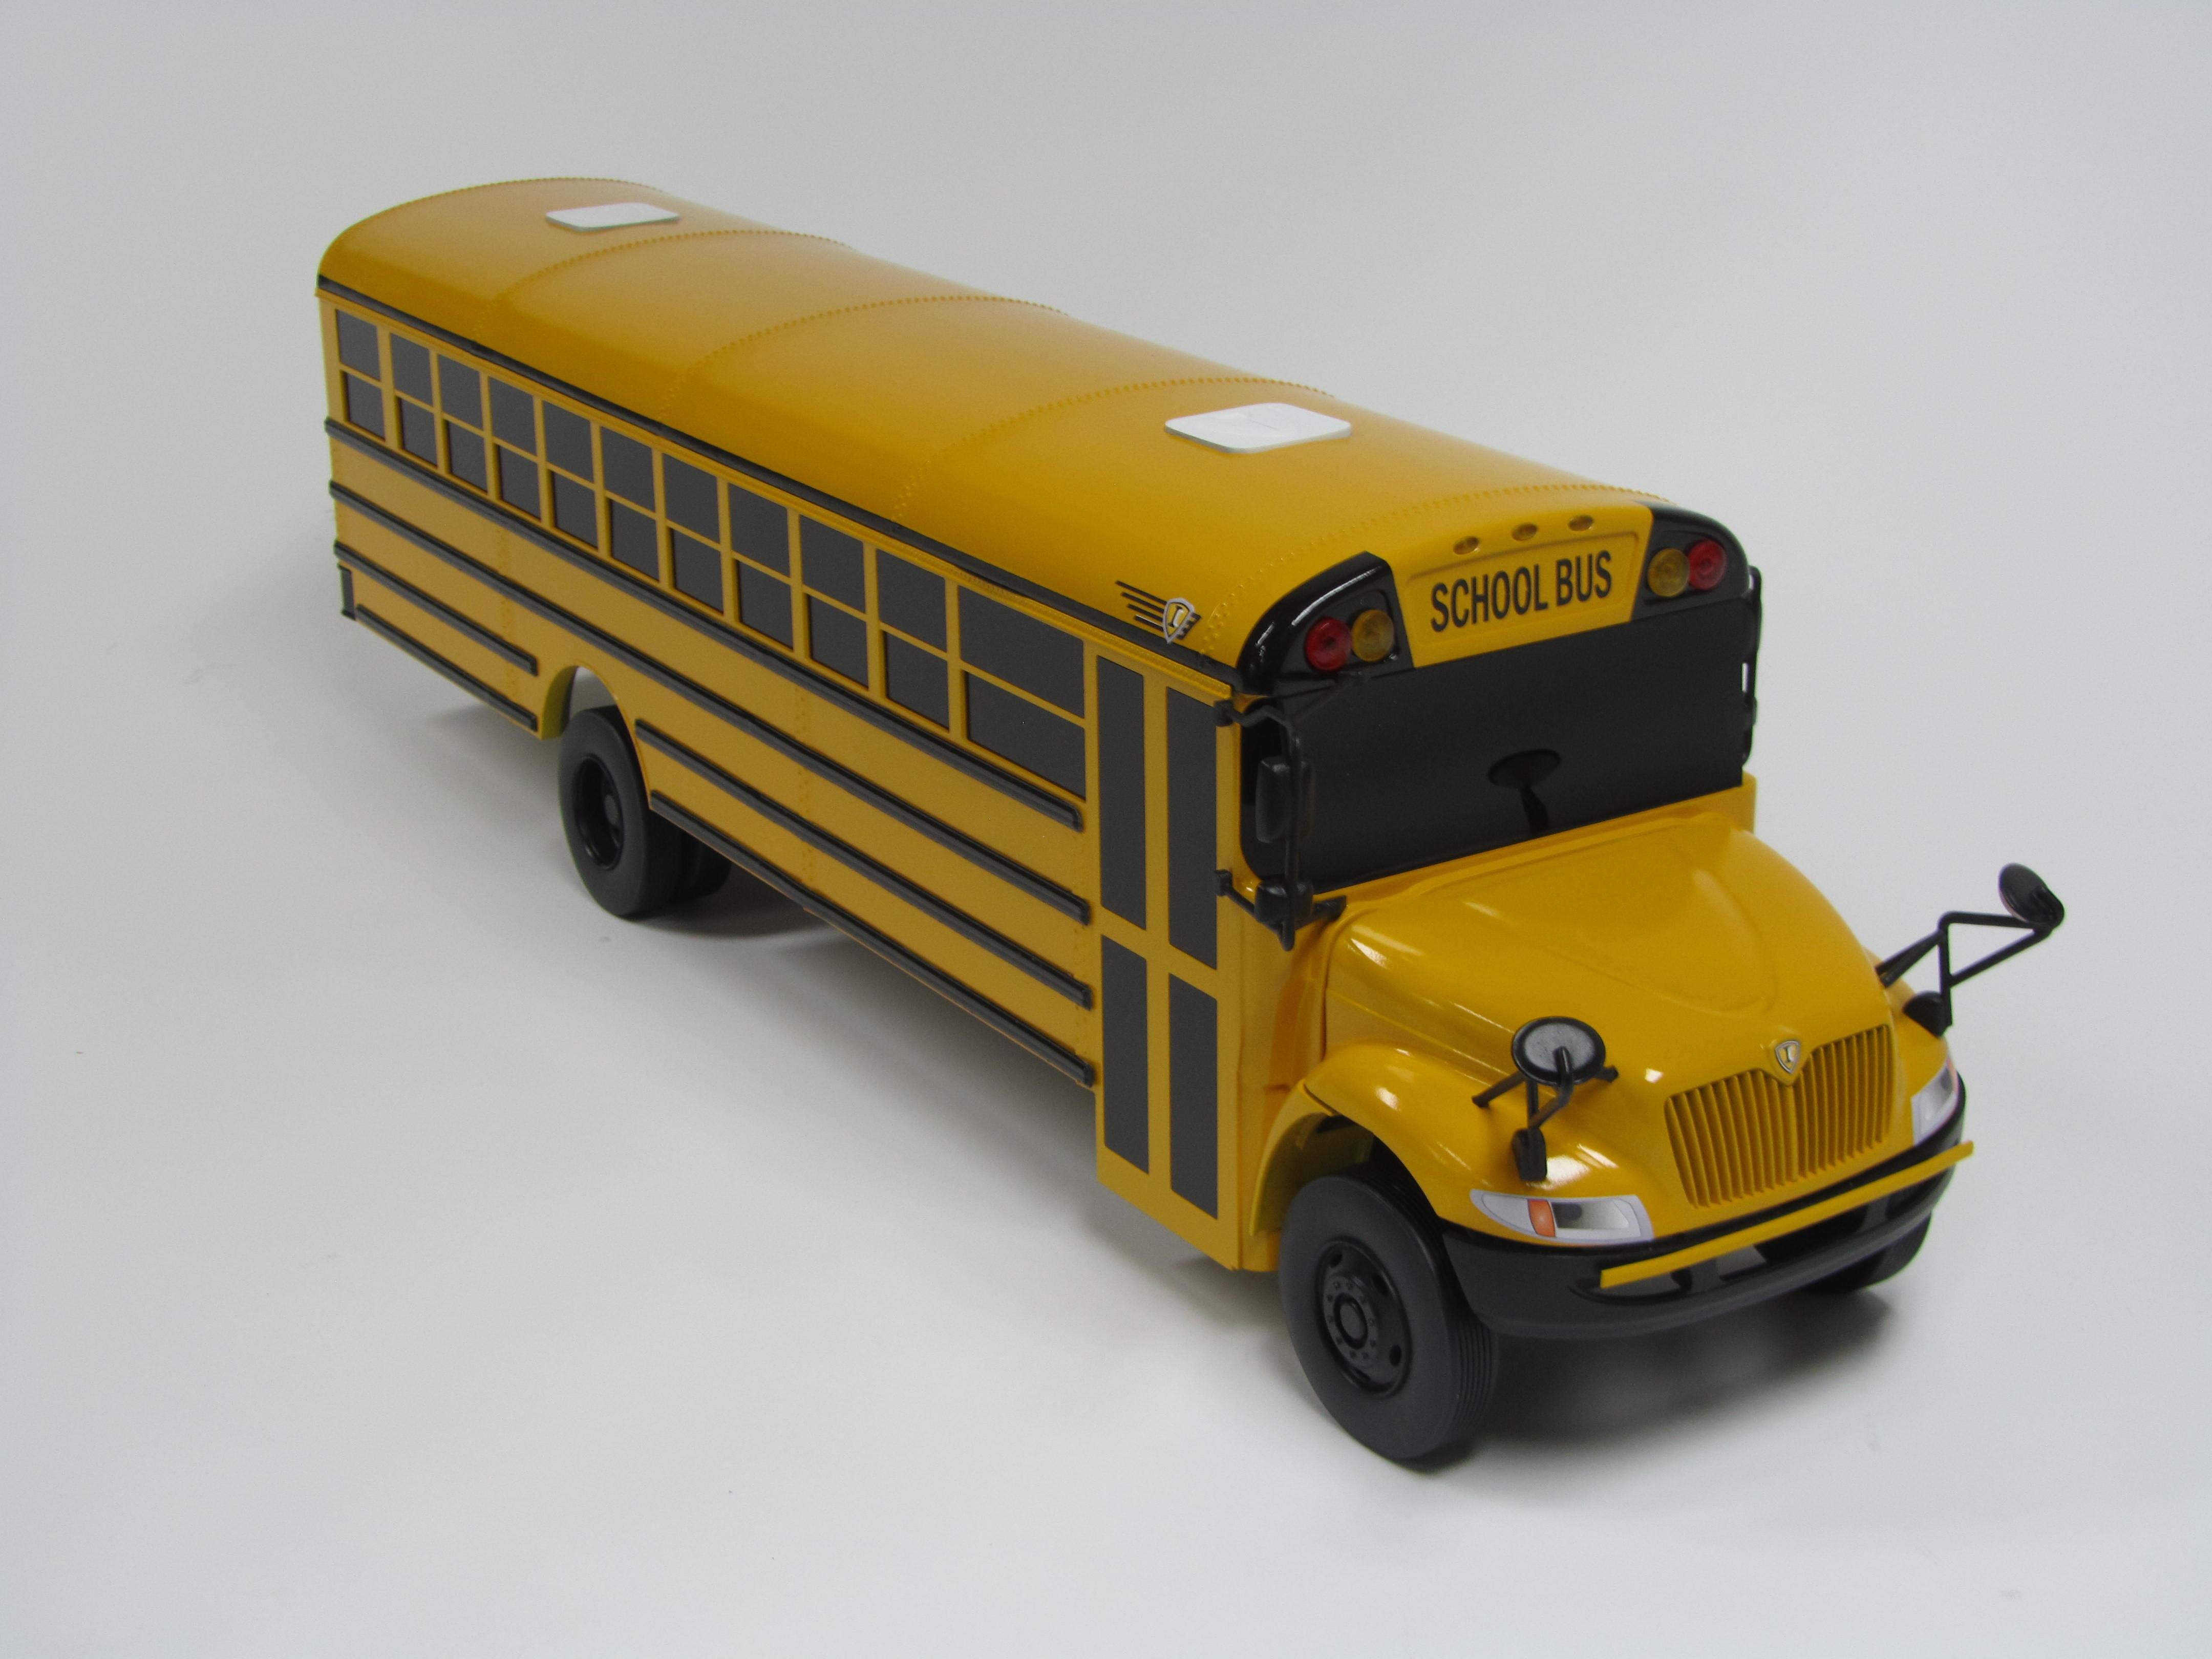 school bus model